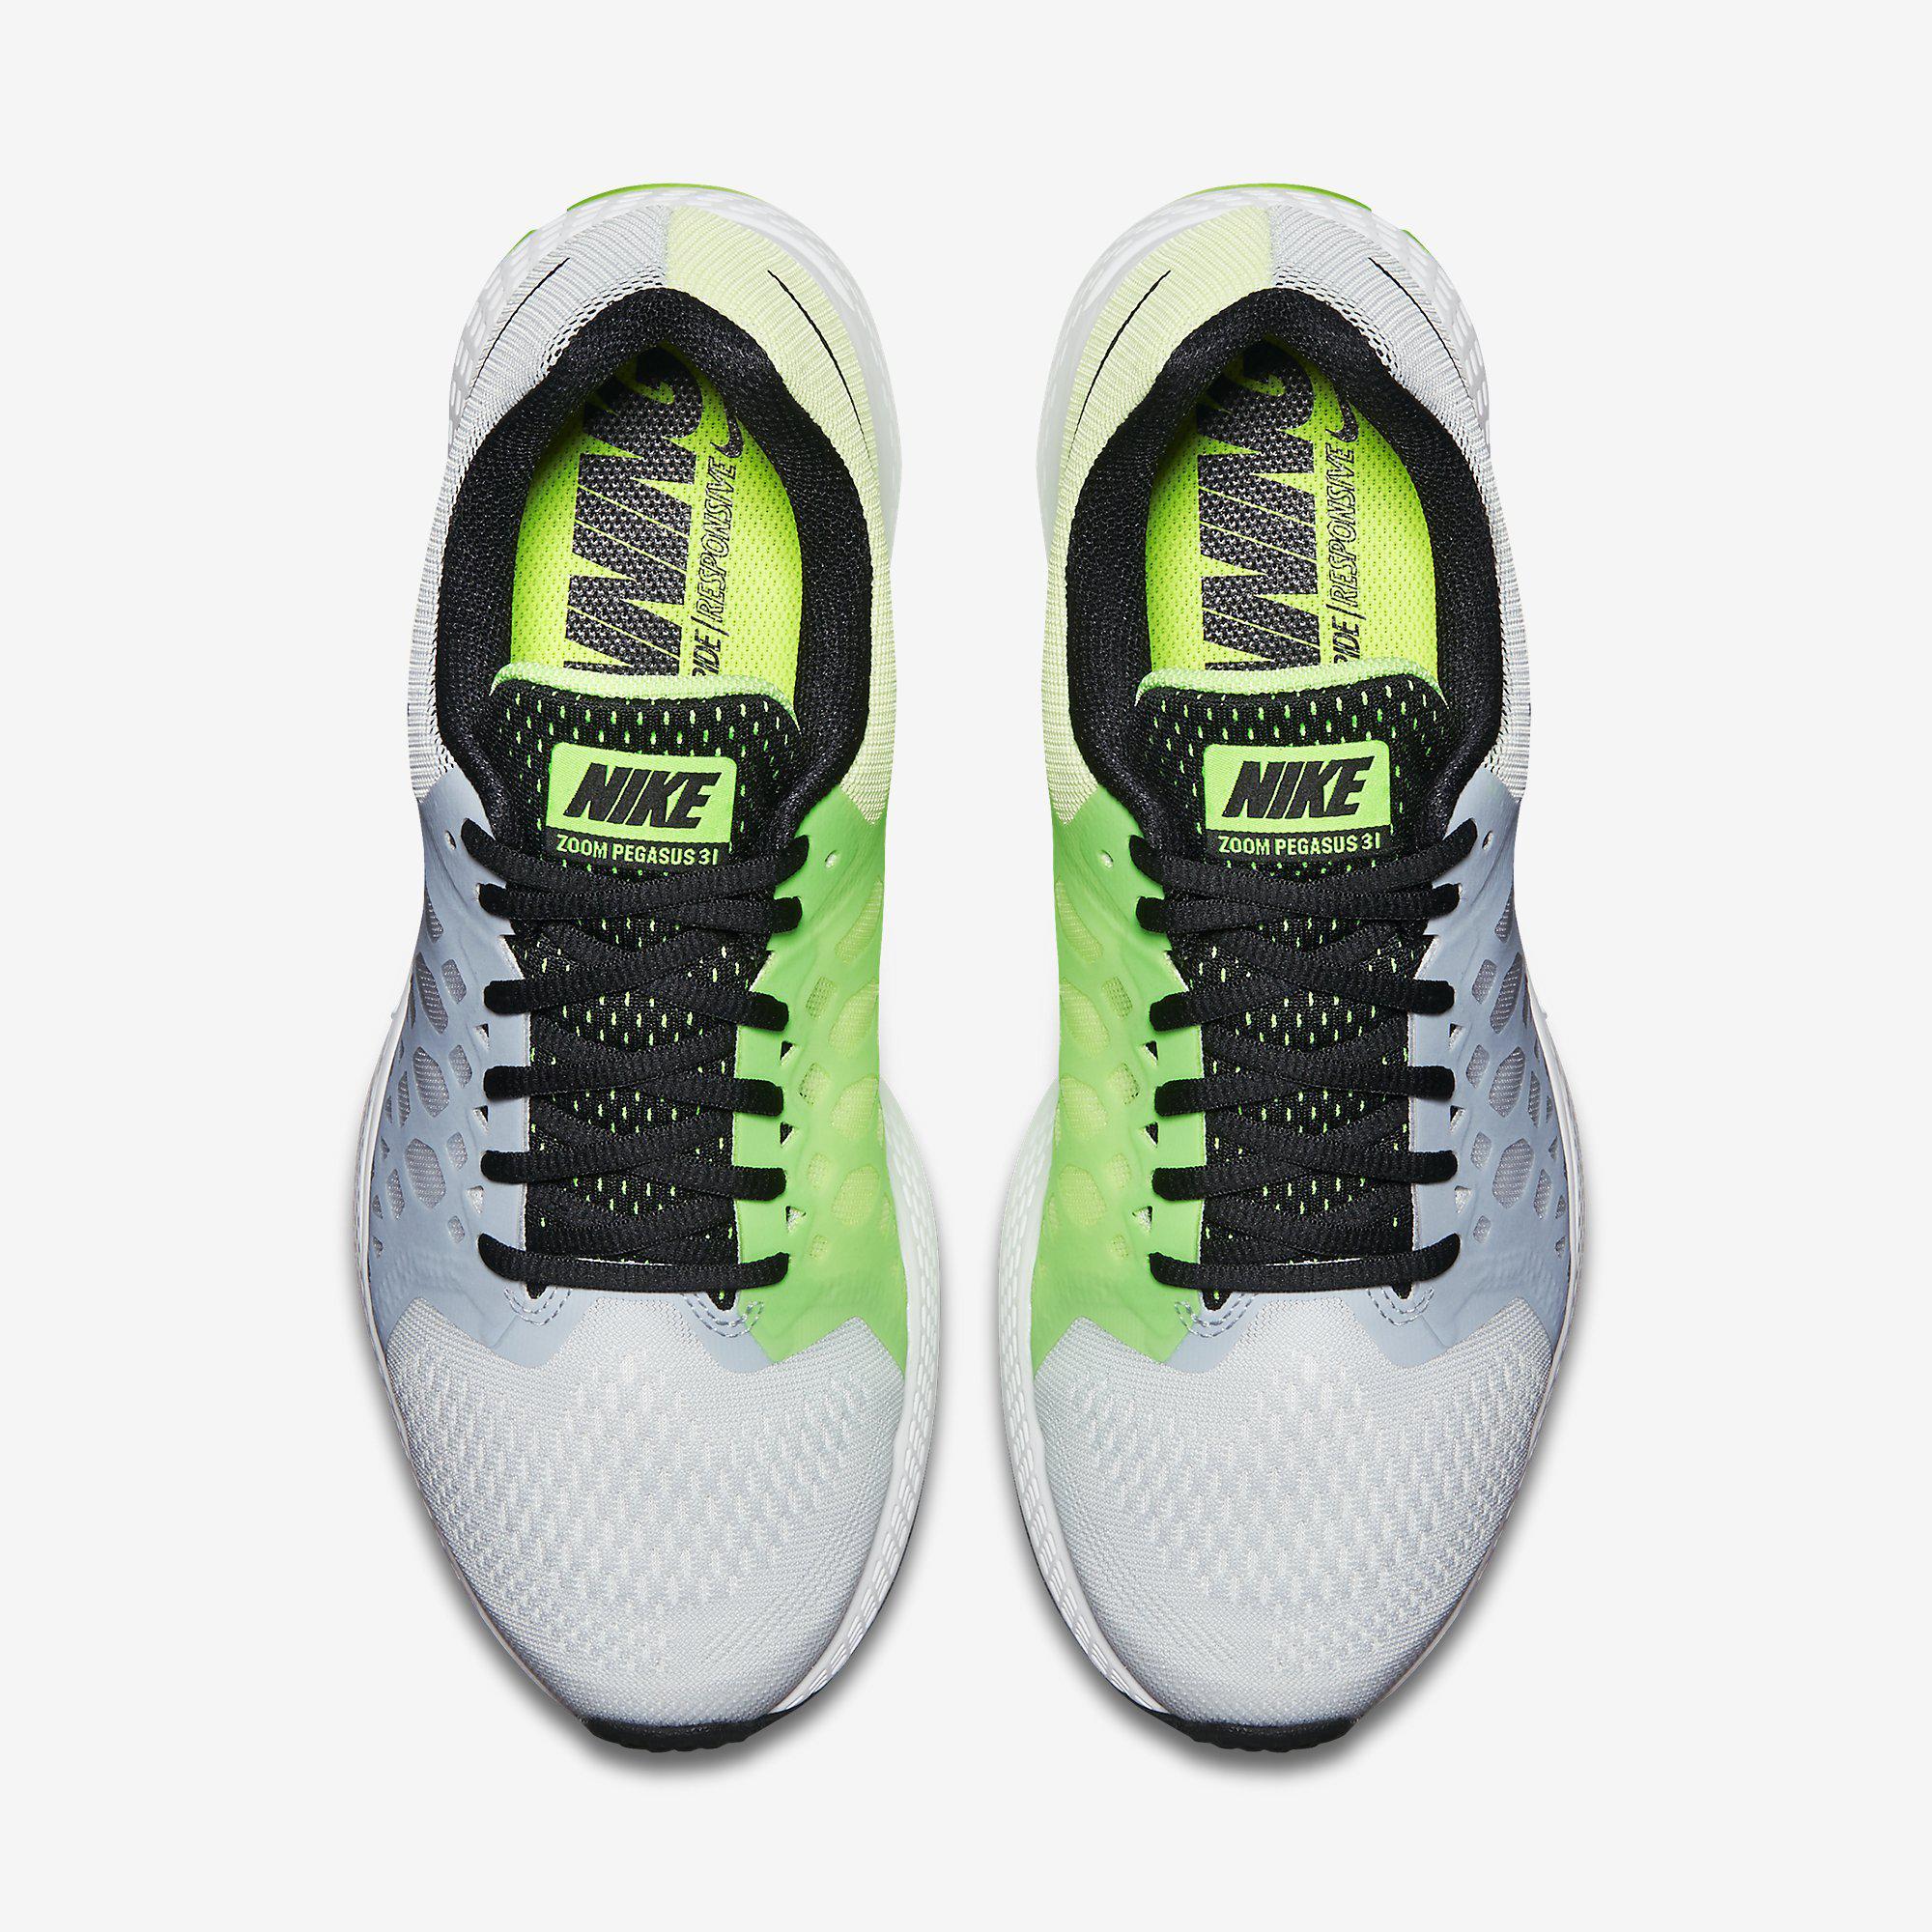 best service 272f2 f6858 ... Purple Cushion Sneakers nike zoom pegasus 31 mens white ...